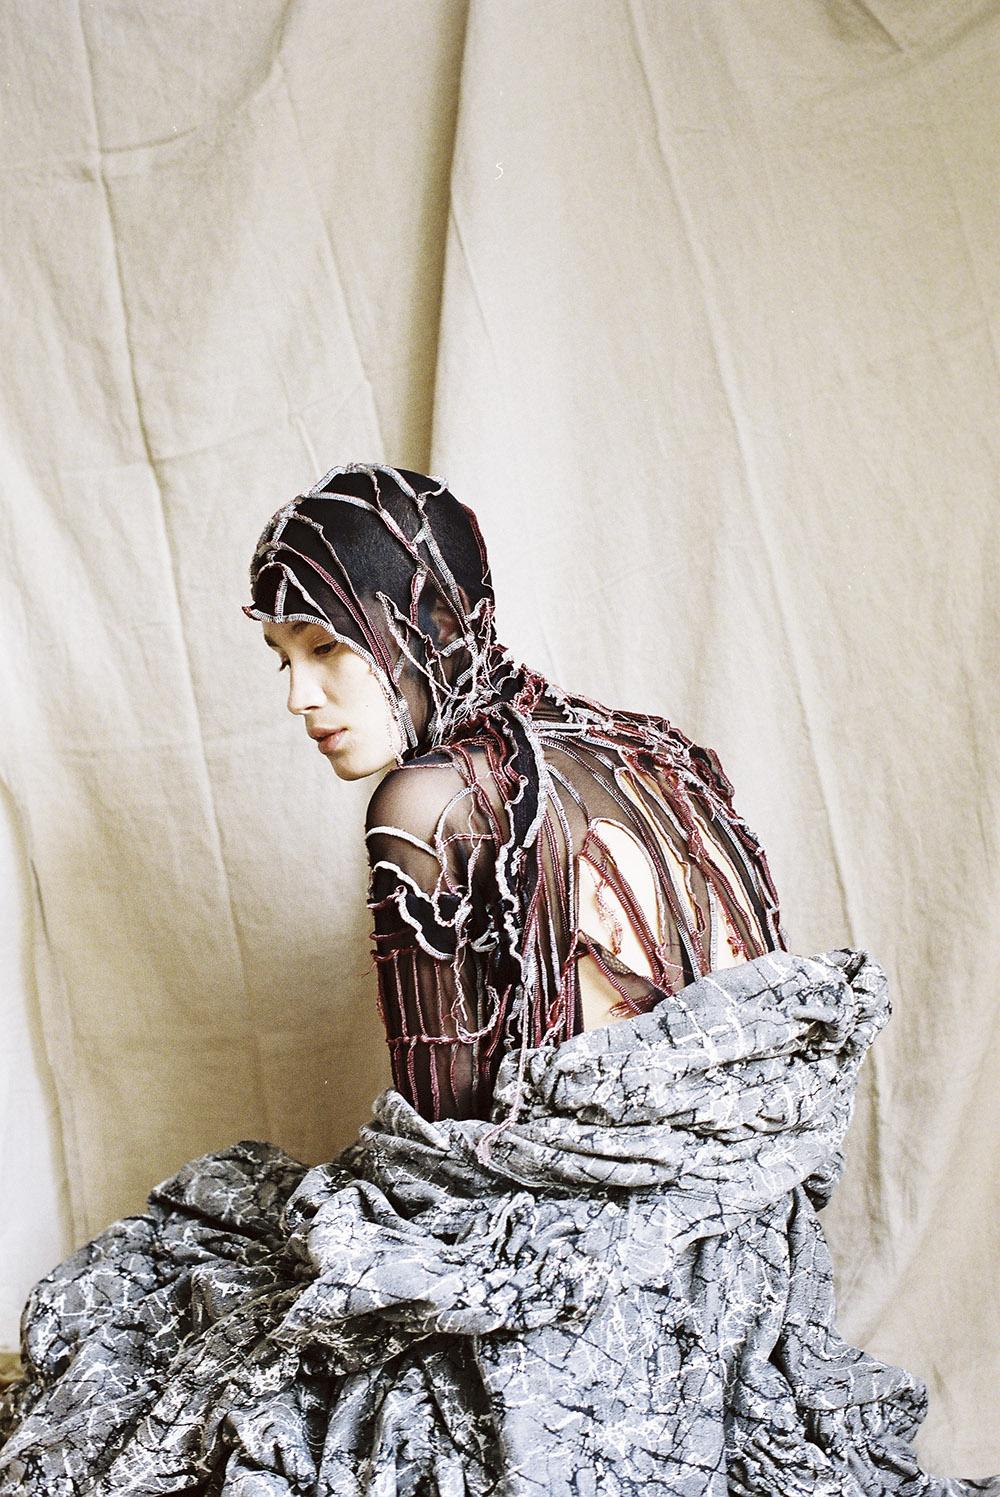 J Ross by BA (Hons) Creative Direction for Fashion graduate Caroline Wong.